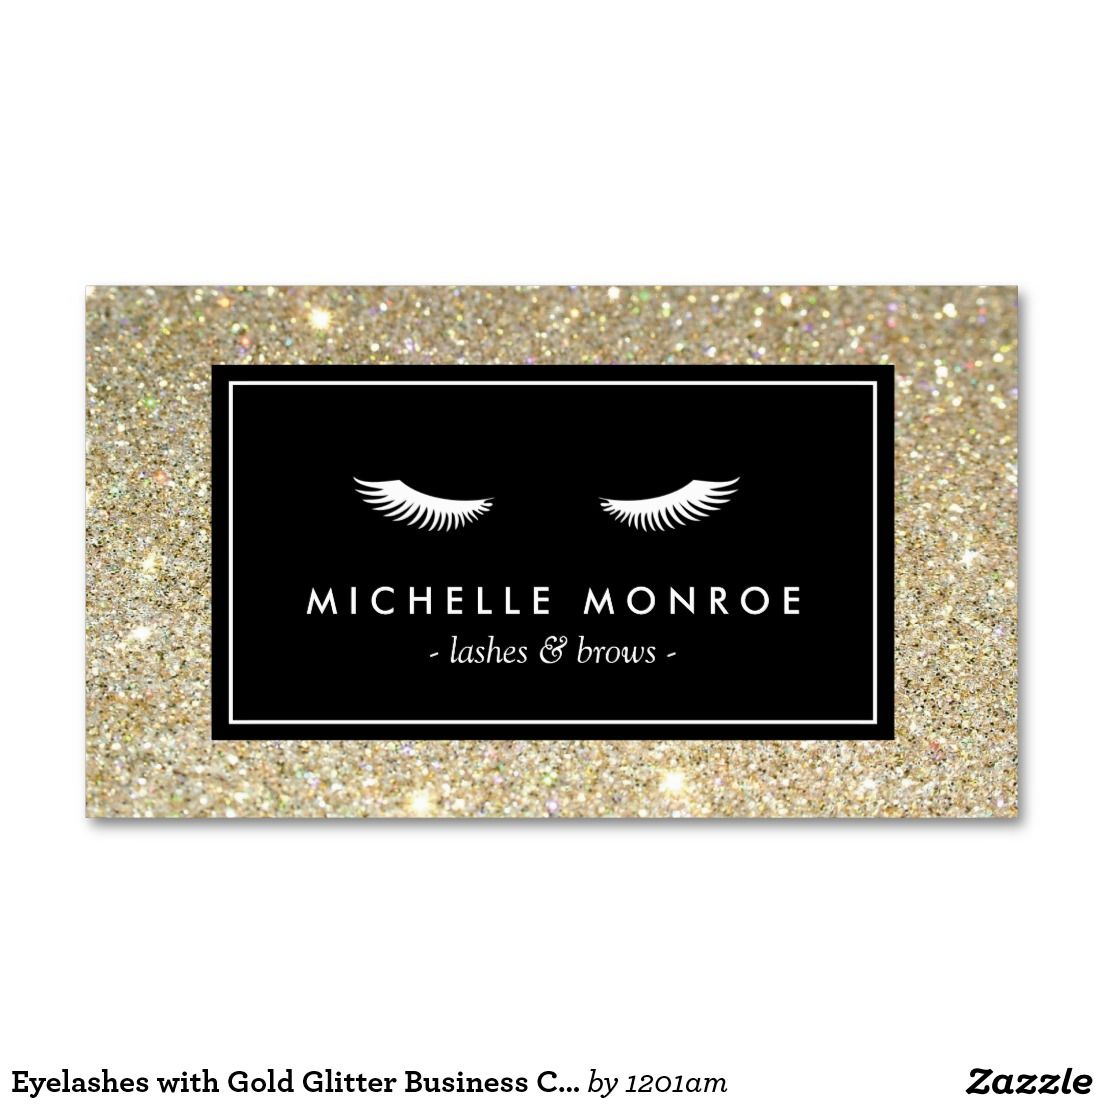 Eyelashes with Gold Glitter Business Card | Zazzle com